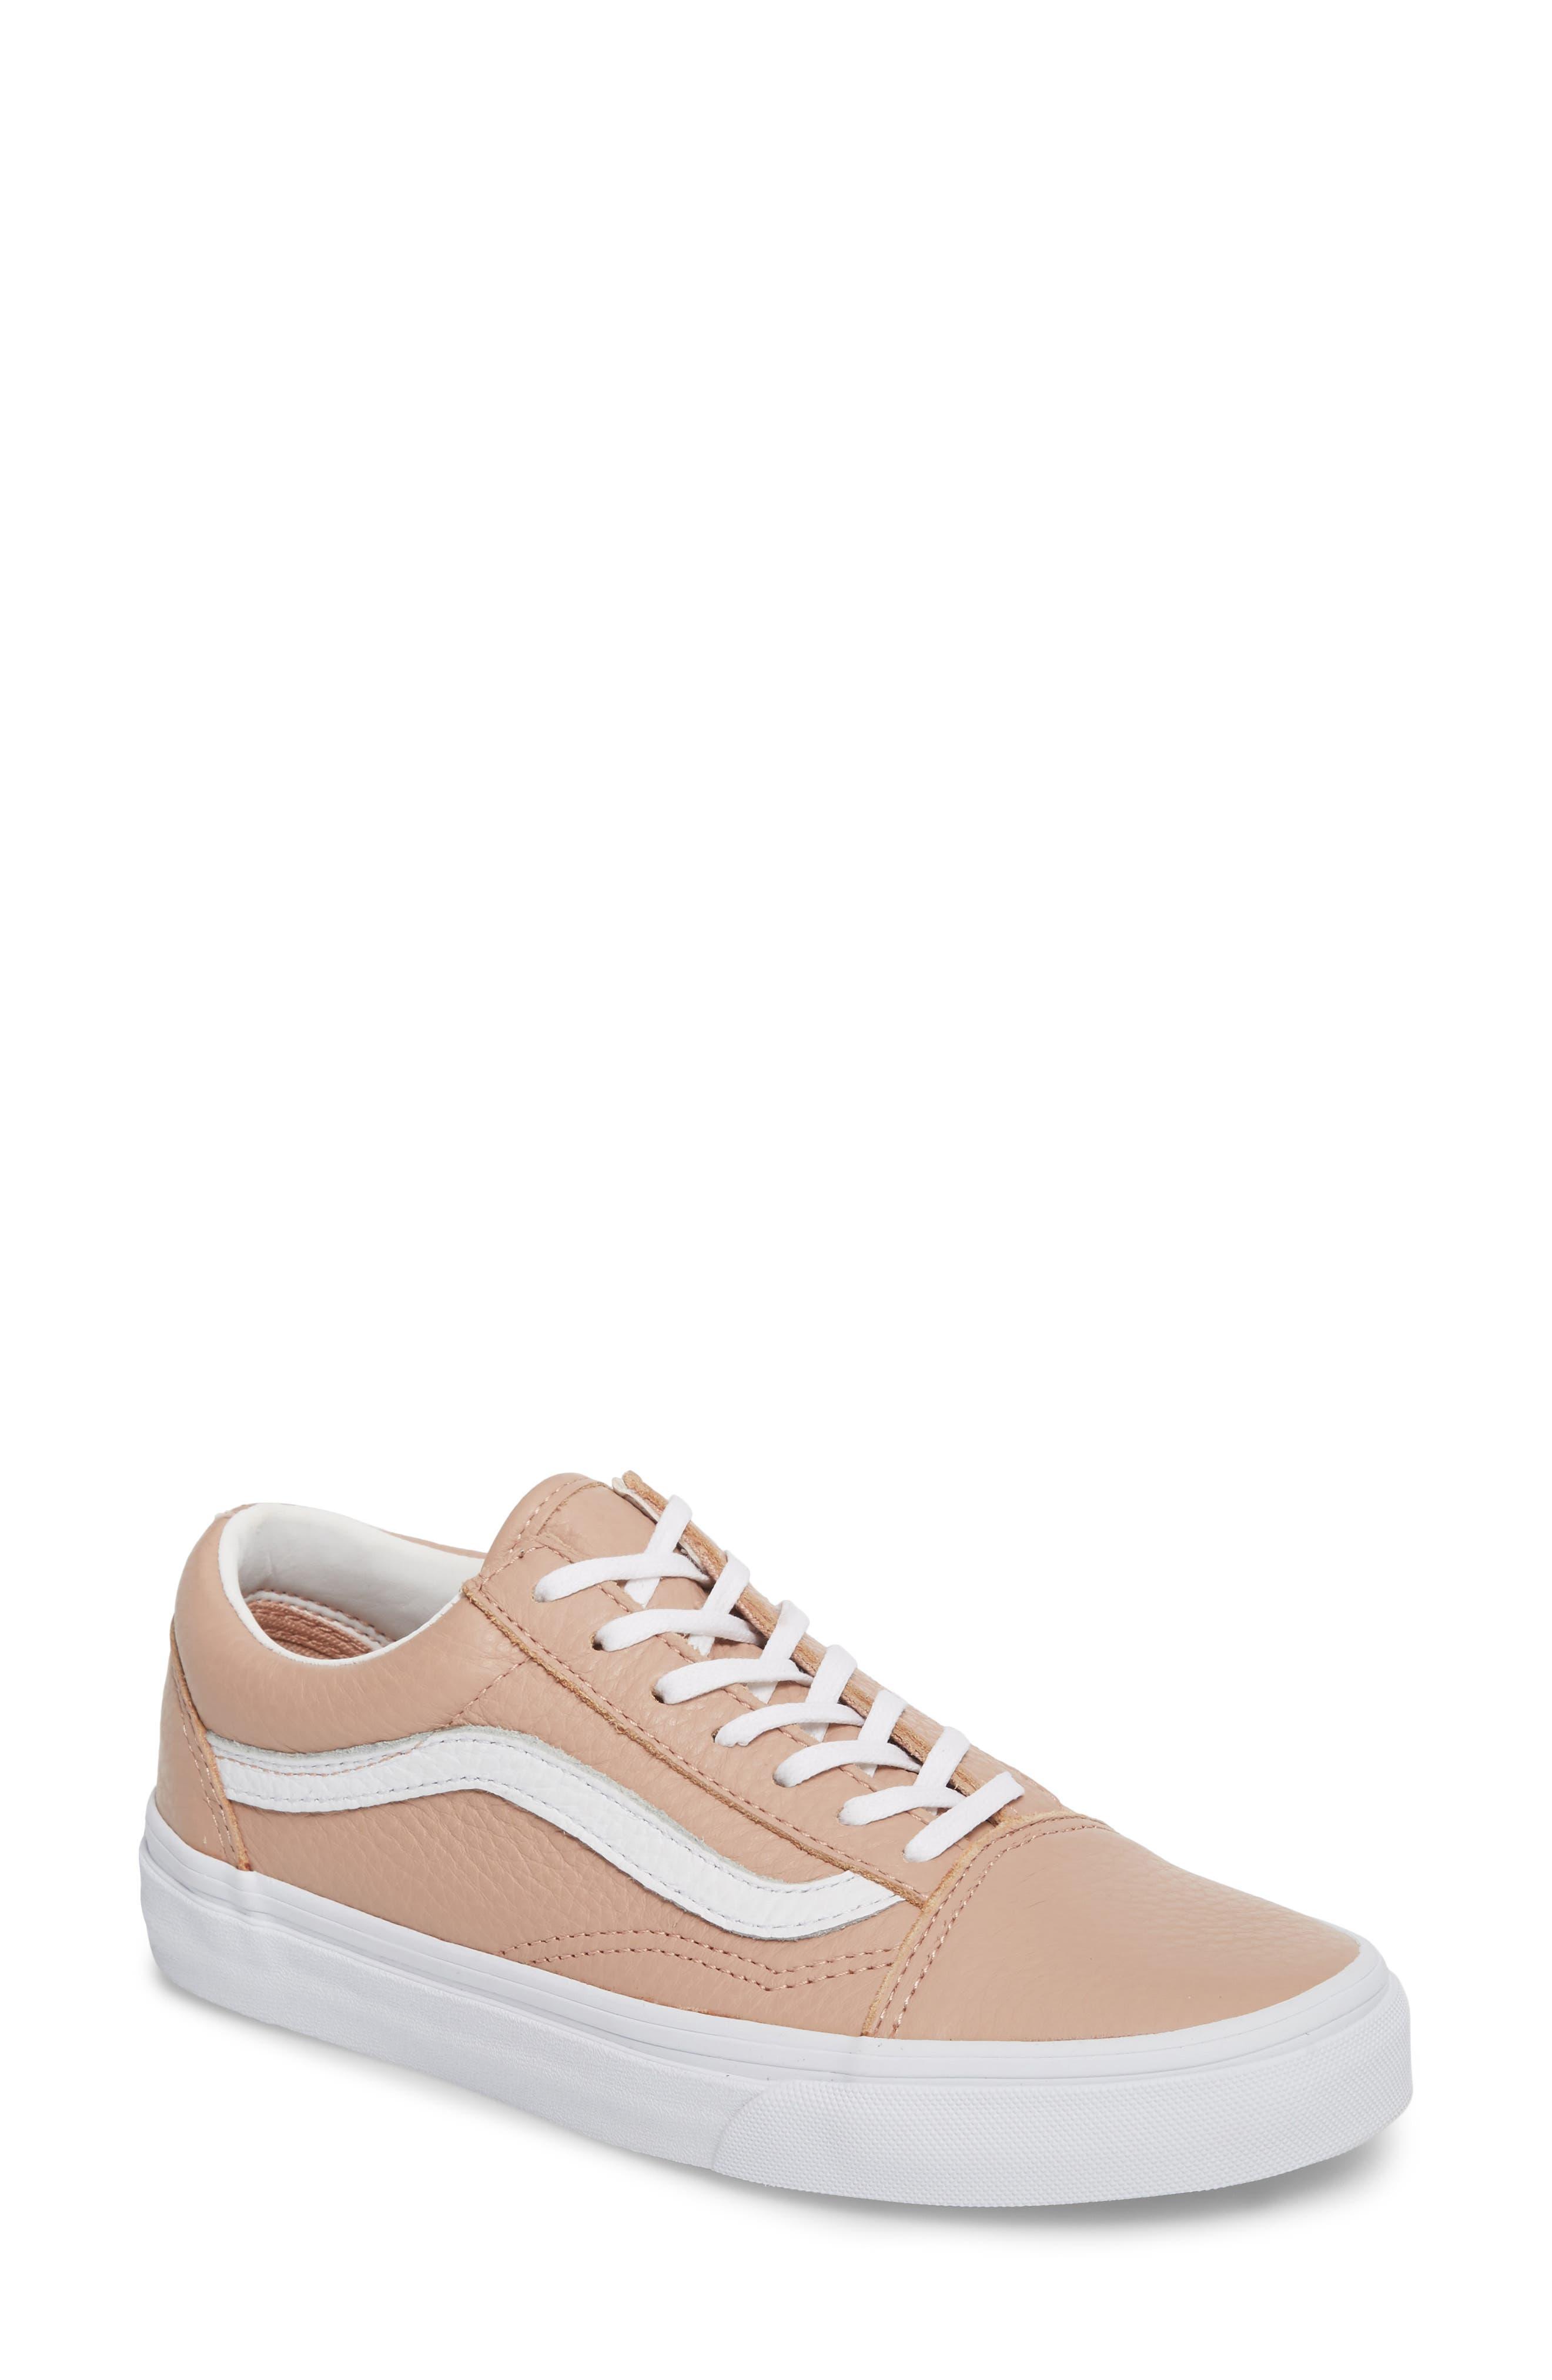 Vans Old Skool DX Sneaker (Women)